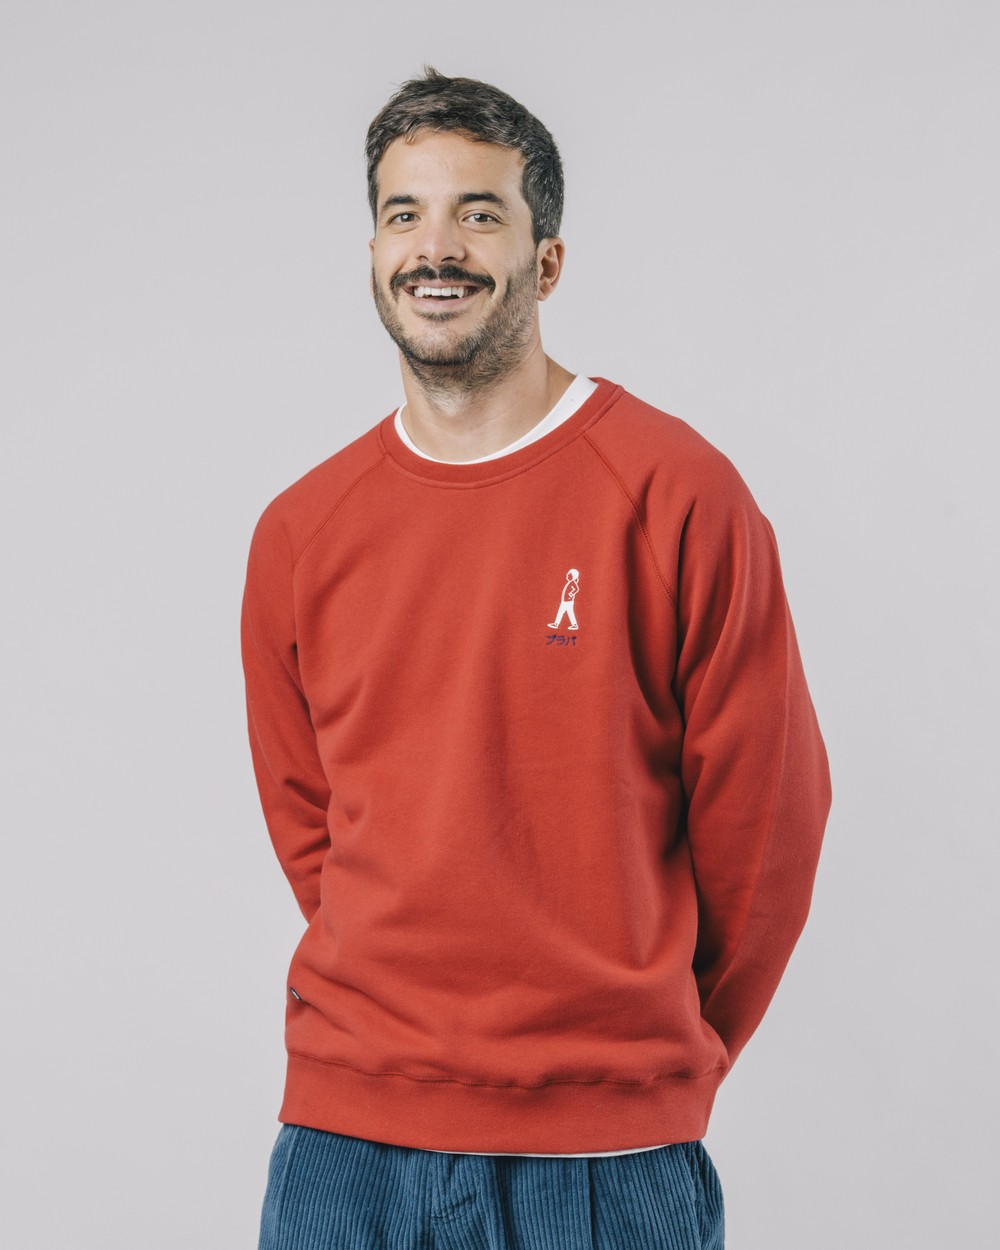 Akito walking sweatshirt - Brava Fabrics